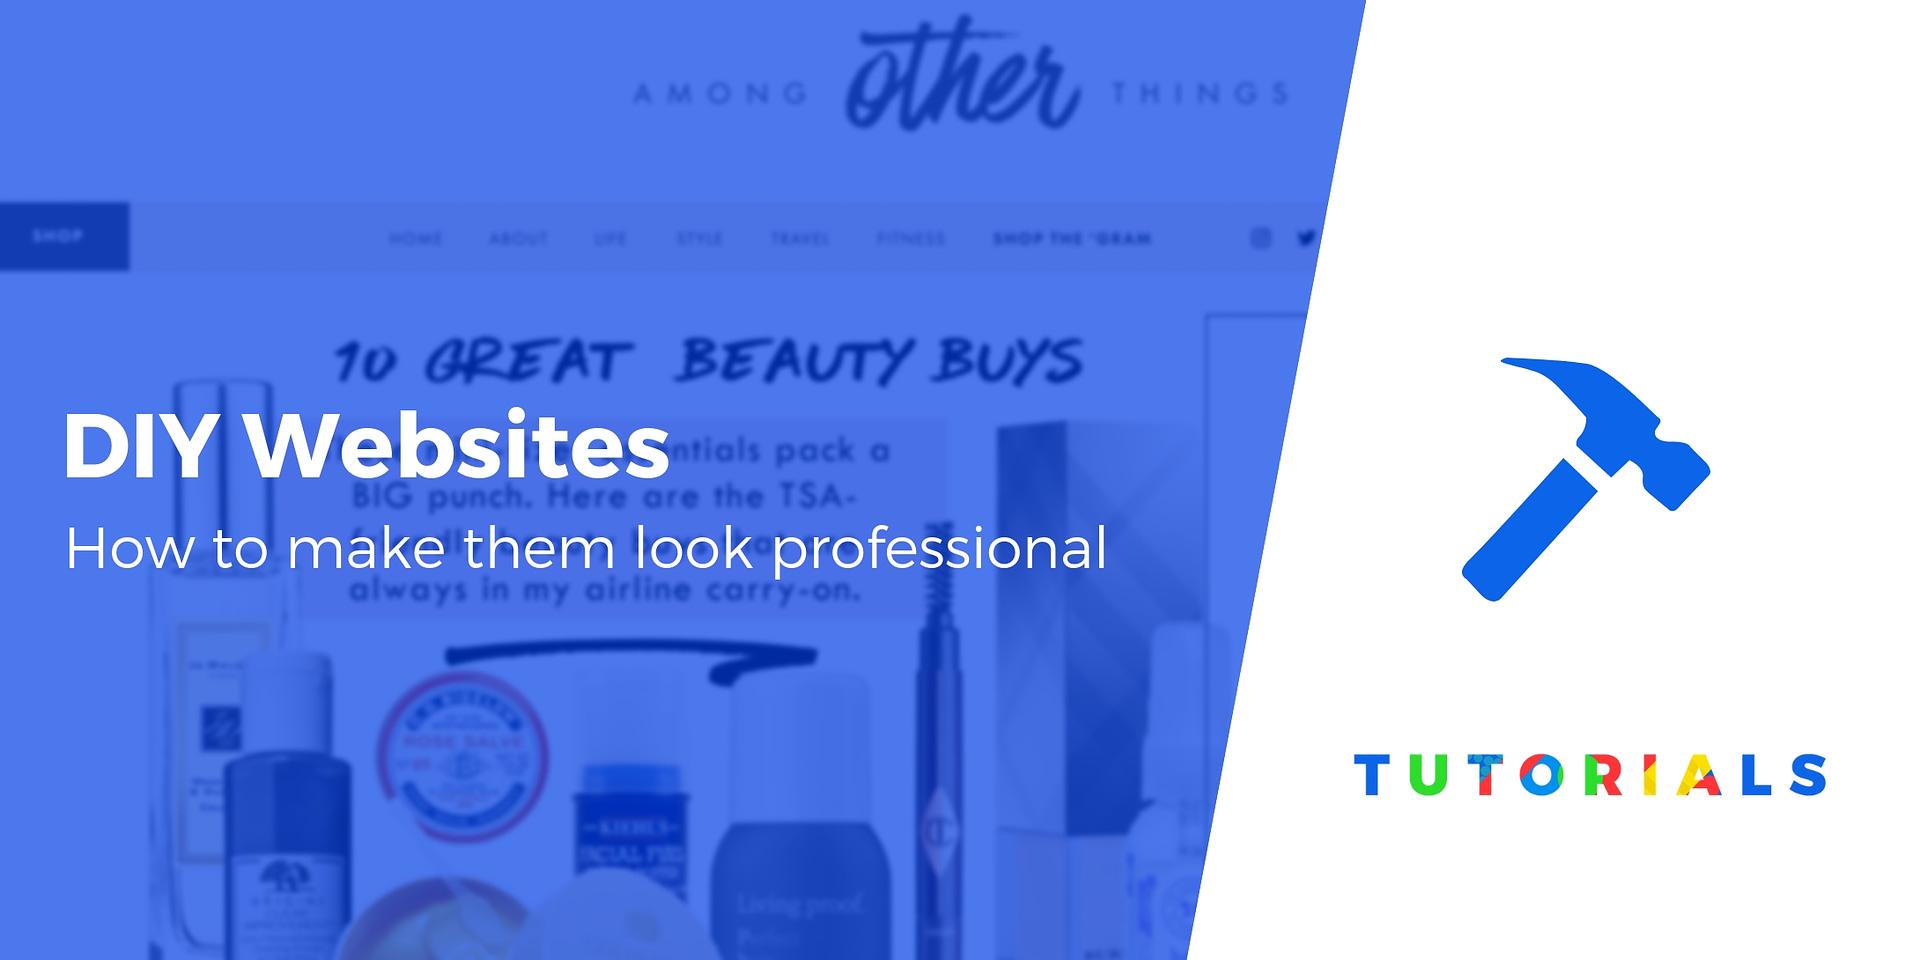 DIY Websites: 10 Web Design Tips That Make Your Site Look Professional